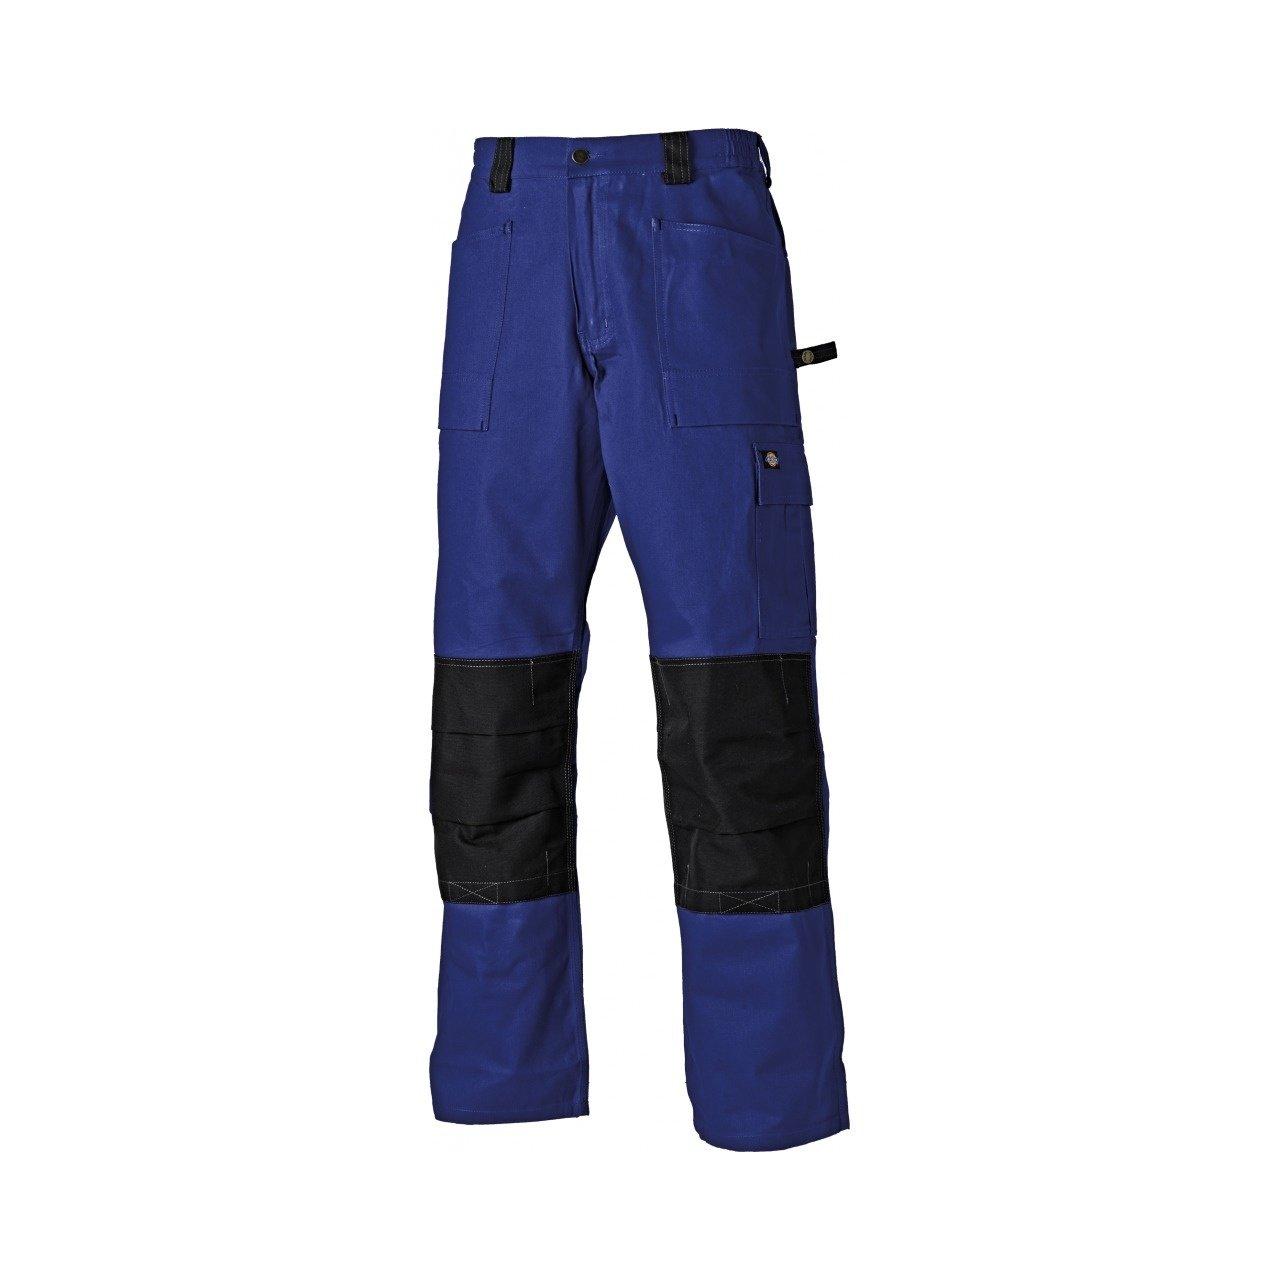 Pantalones de Trabajo para Hombre Dickies GTD290 Trouser